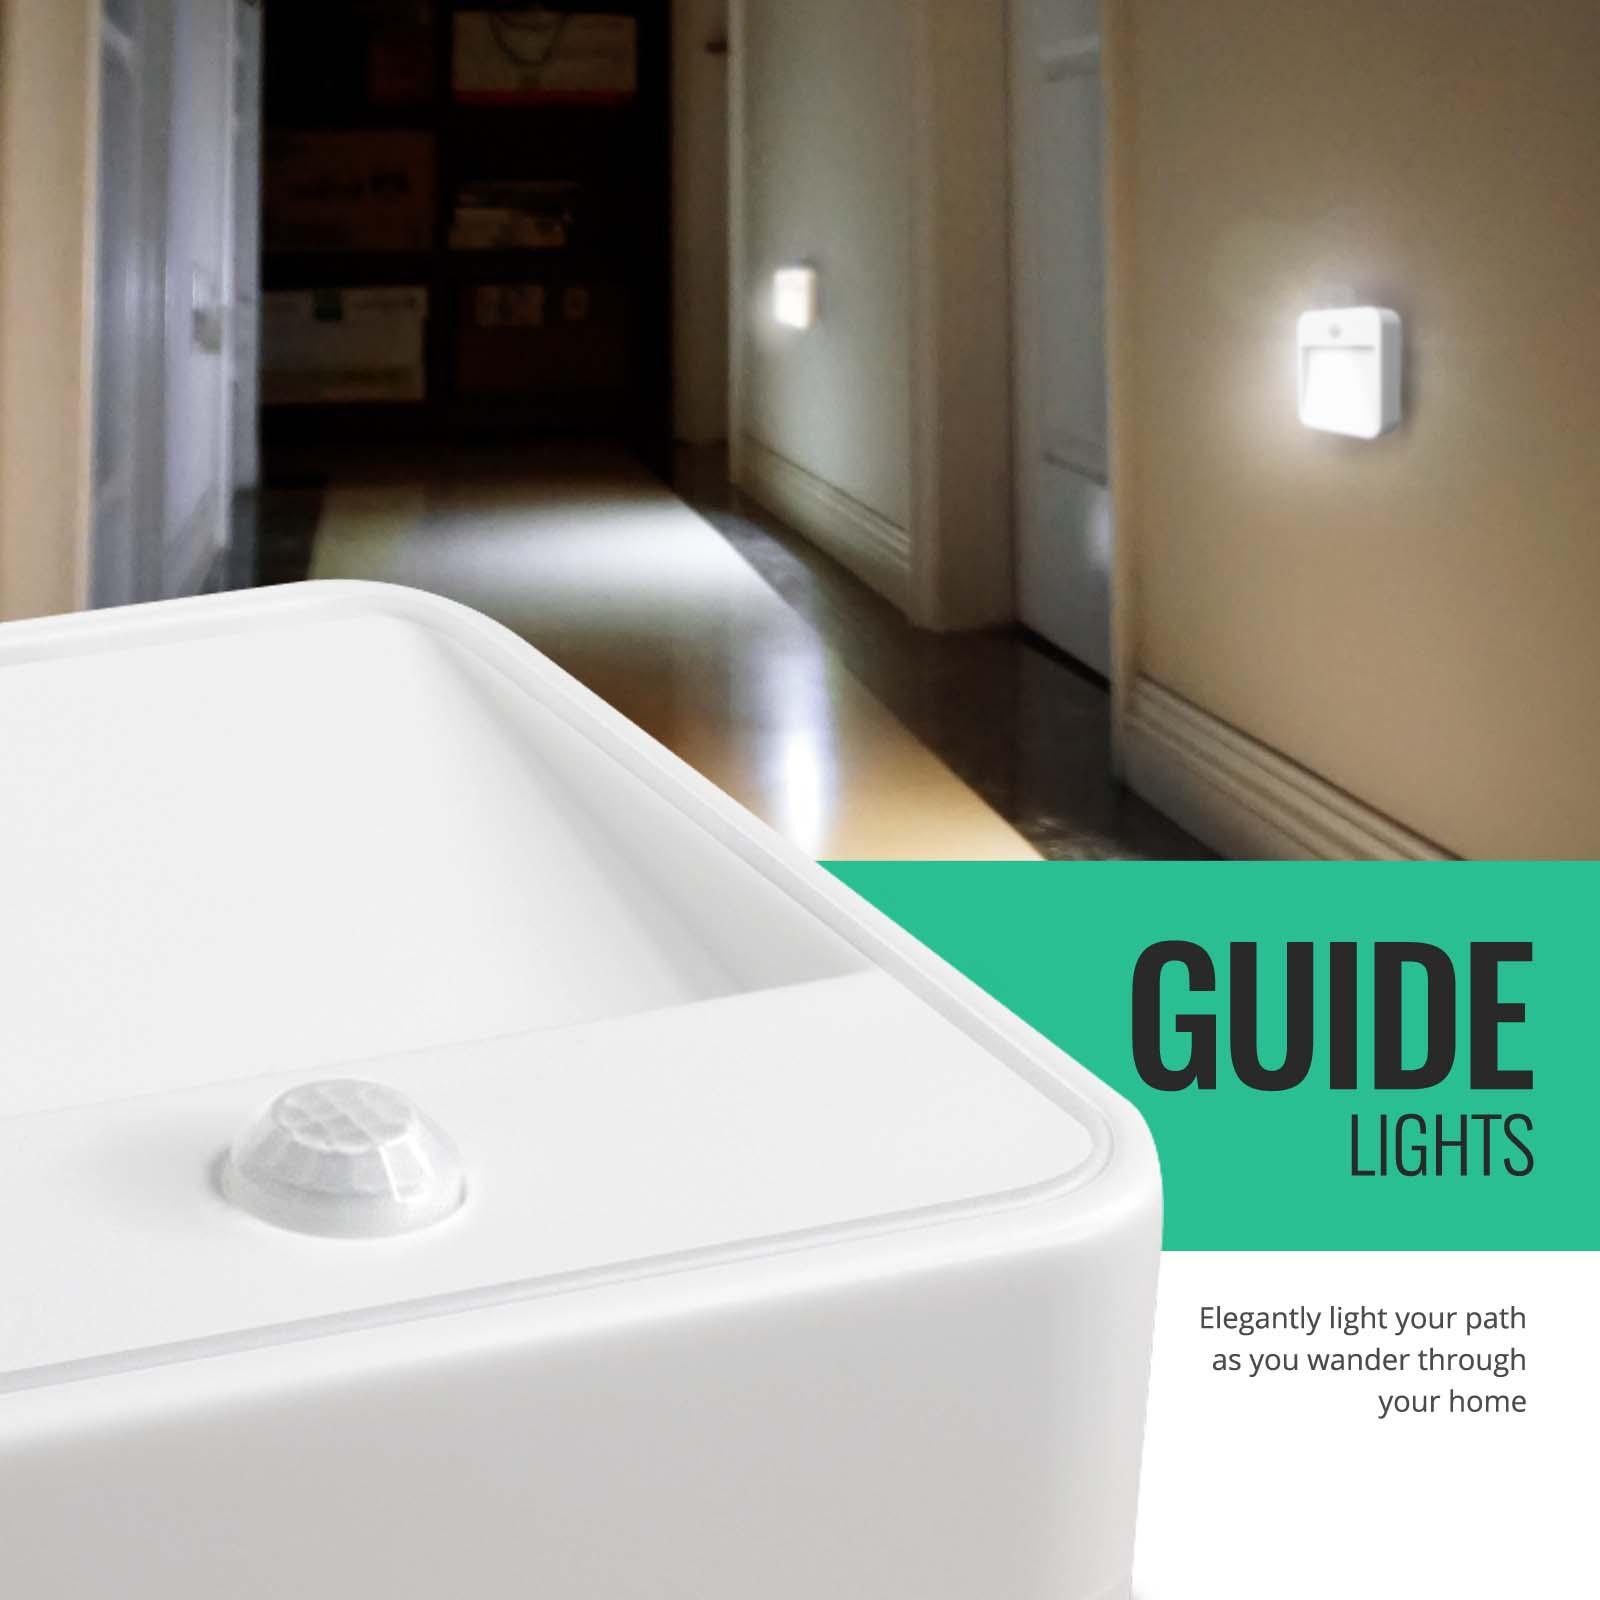 3x Bathroom Cabinet Battery Operated Led Guide Light Pir 20 Lumen Modern Ebay